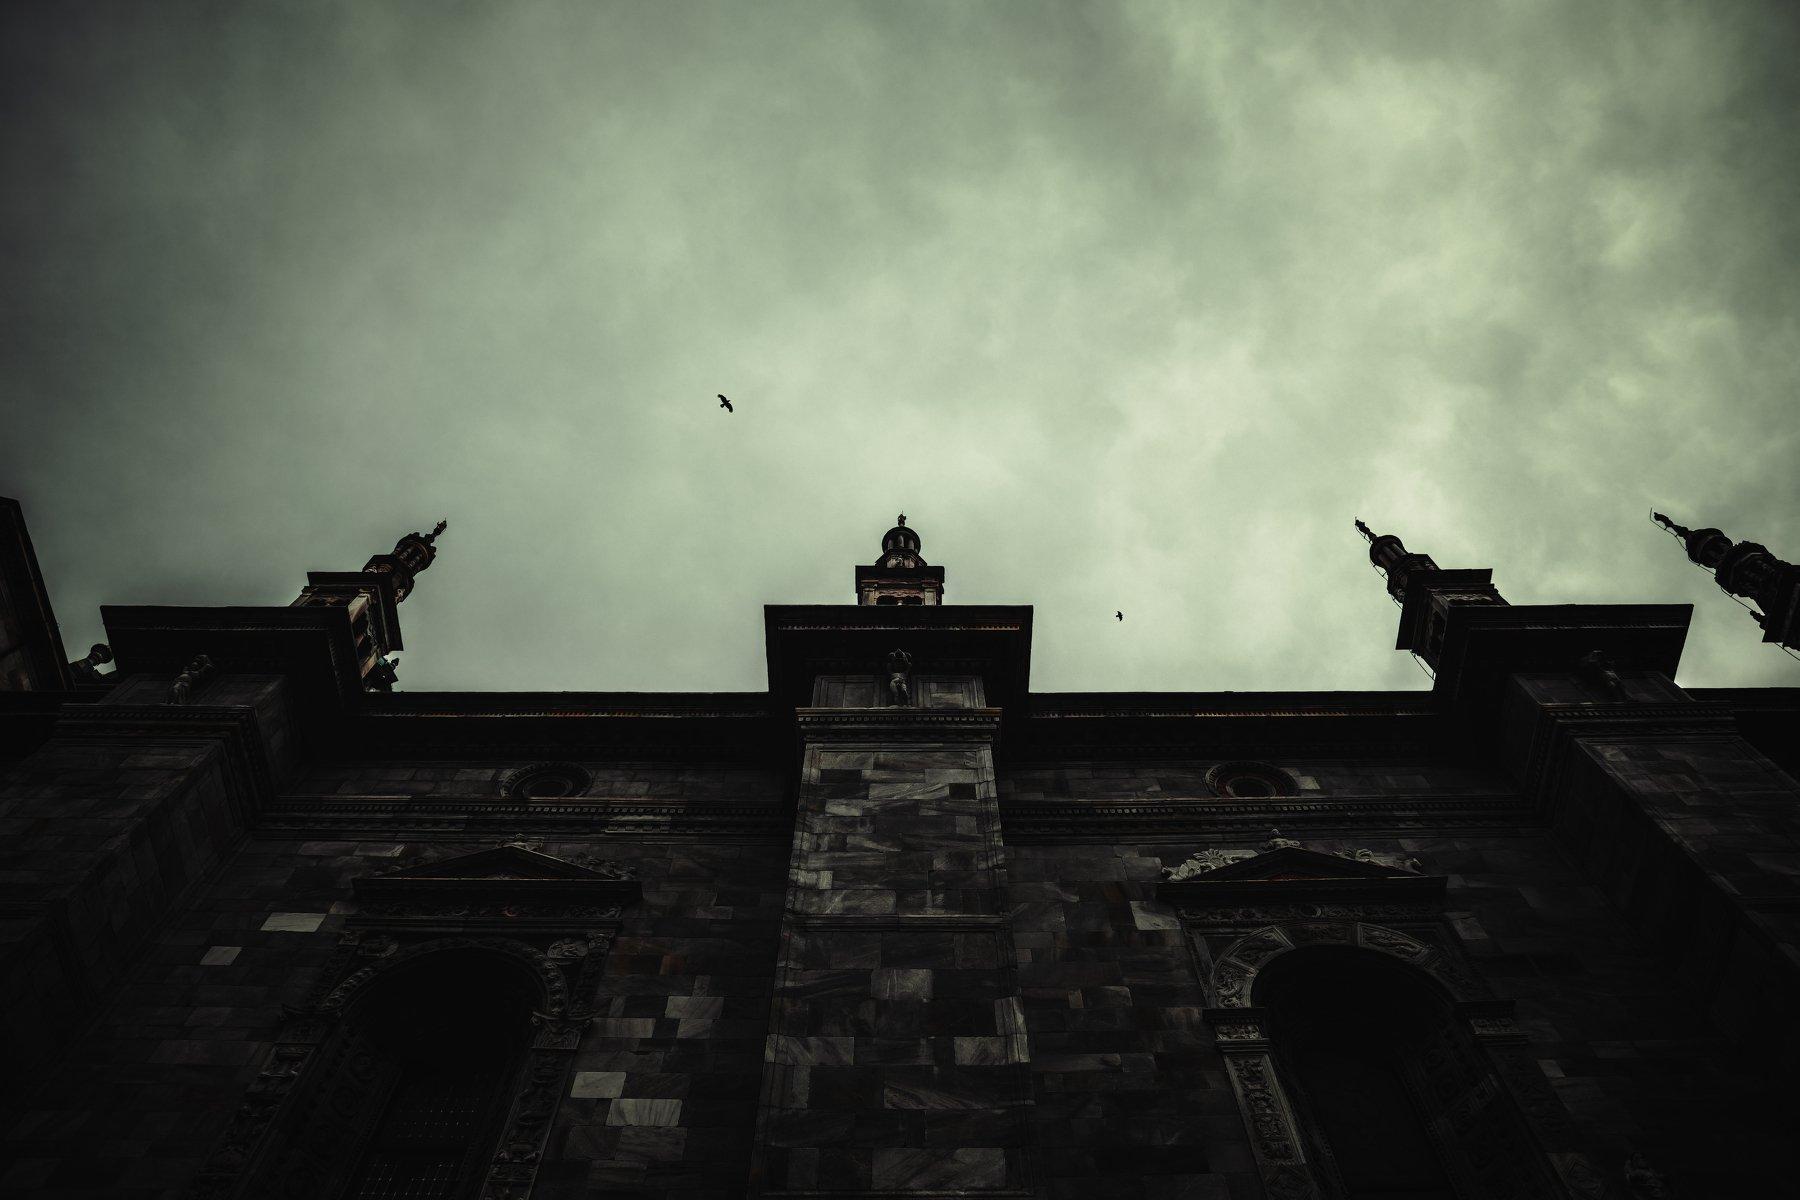 #cathedral #como #italy #gothic, DAlonzo Sabrina